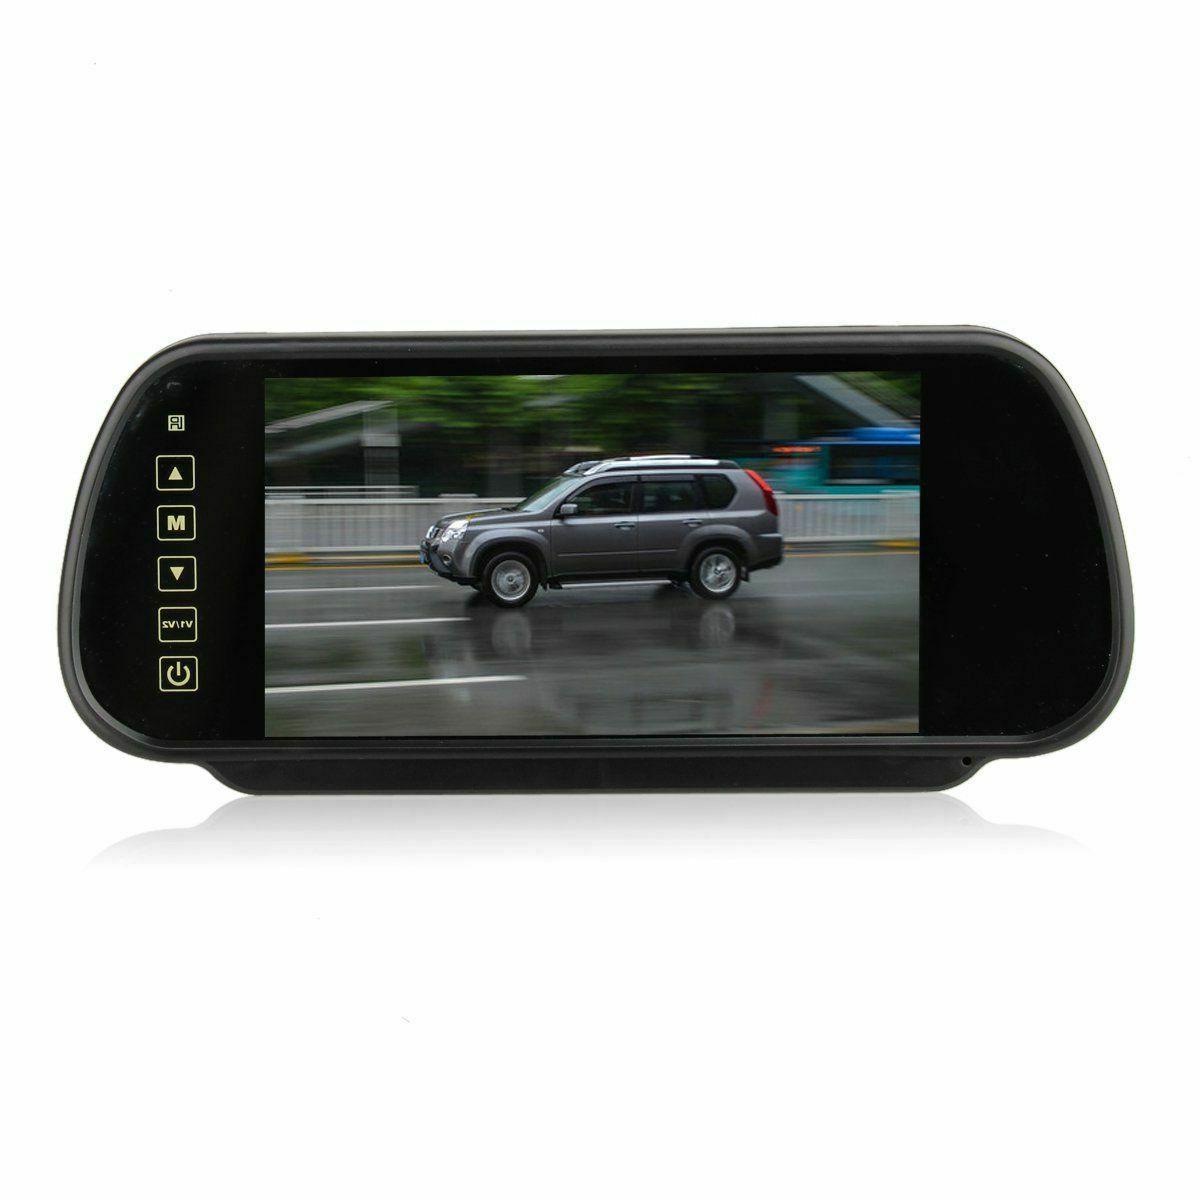 "7"" LCD Screen Rear Camera Wird"